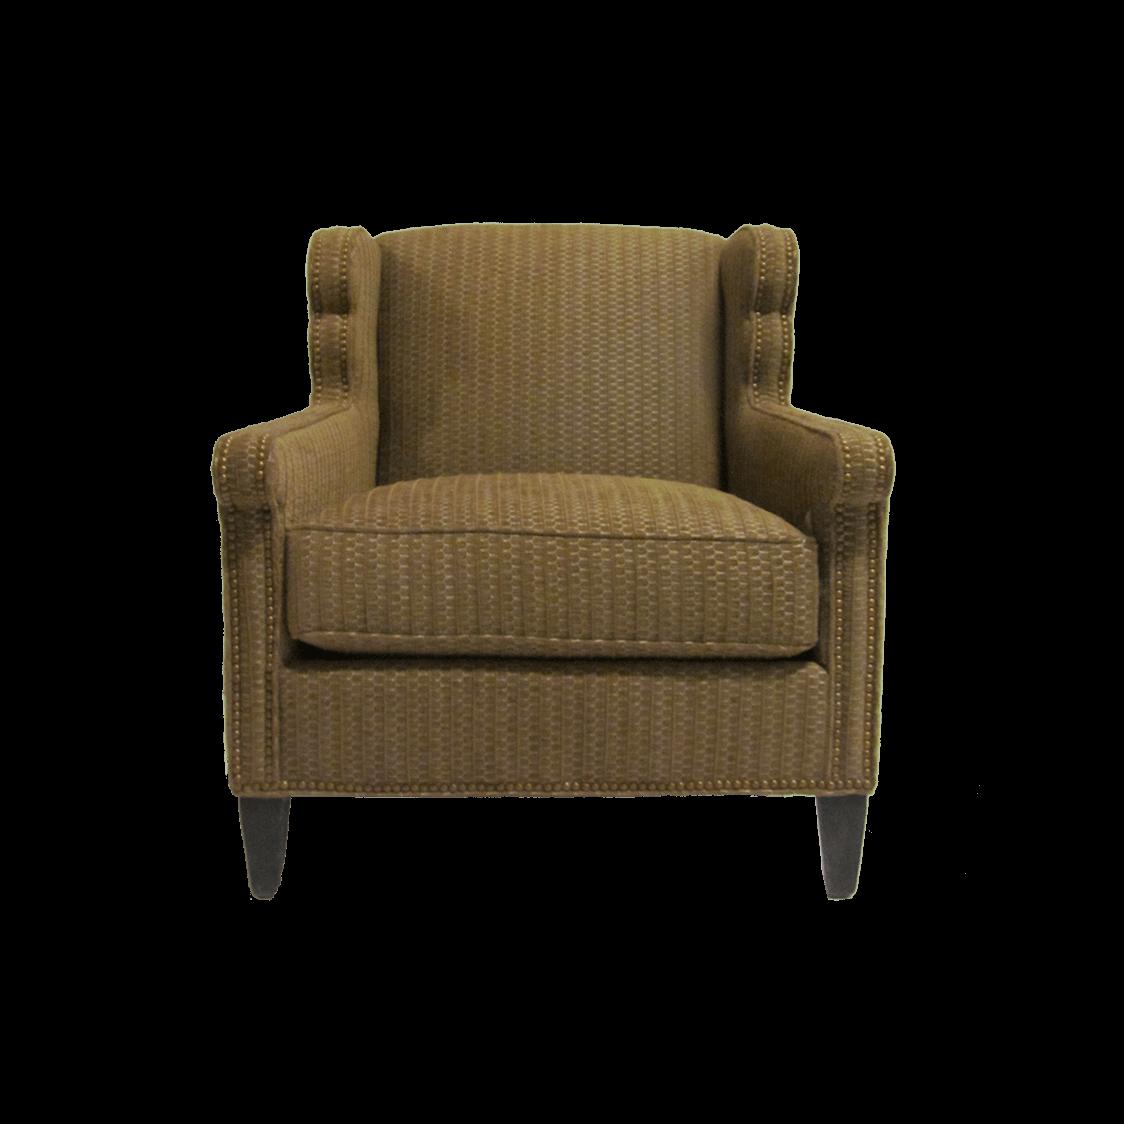 Huntington_Furniture_Co_Lounge_Chair- Modified Wingback